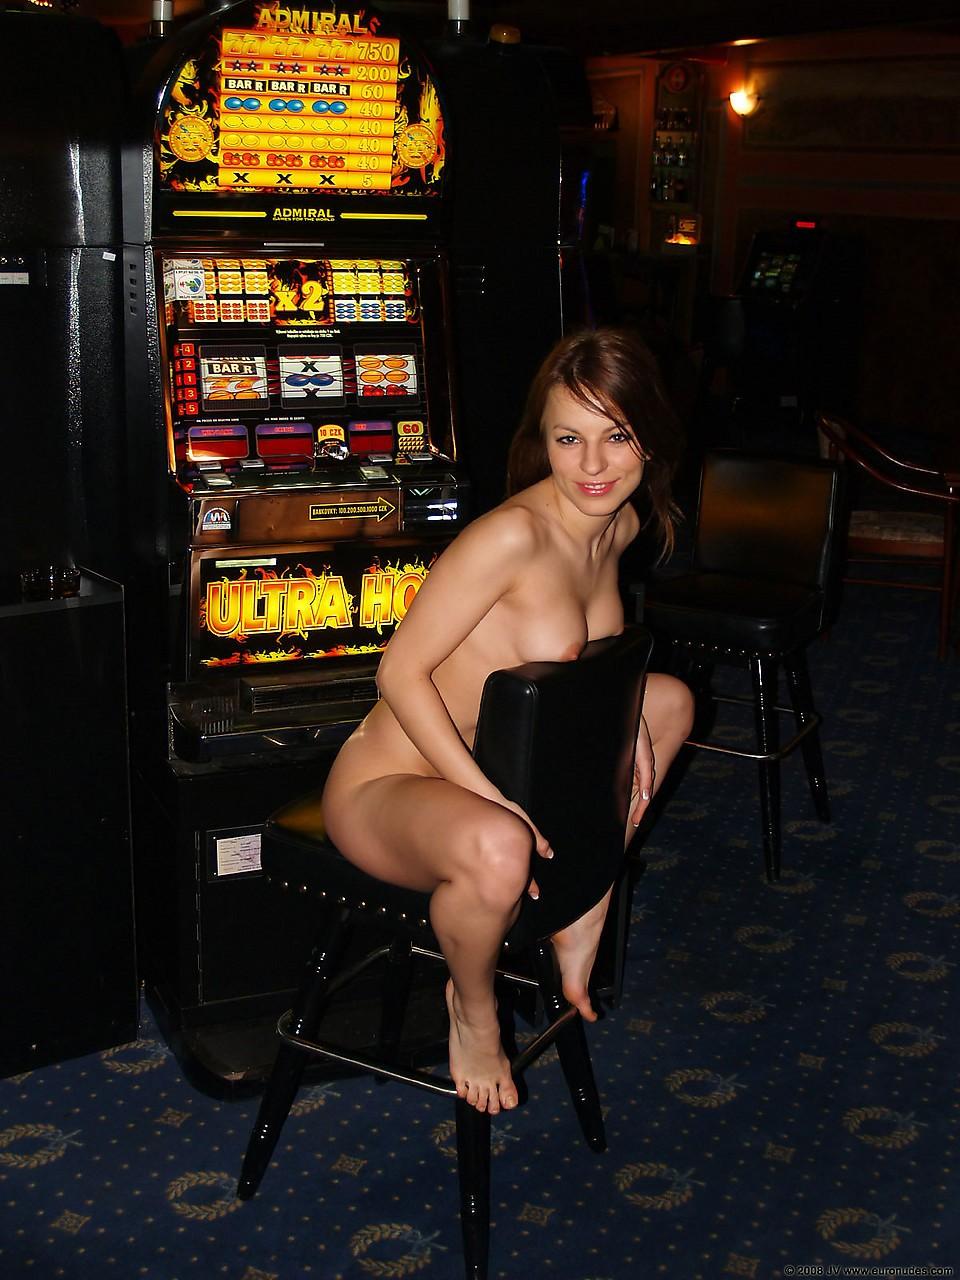 Mila azul nude model erotic photo shoot fpr plushies tv - 5 7